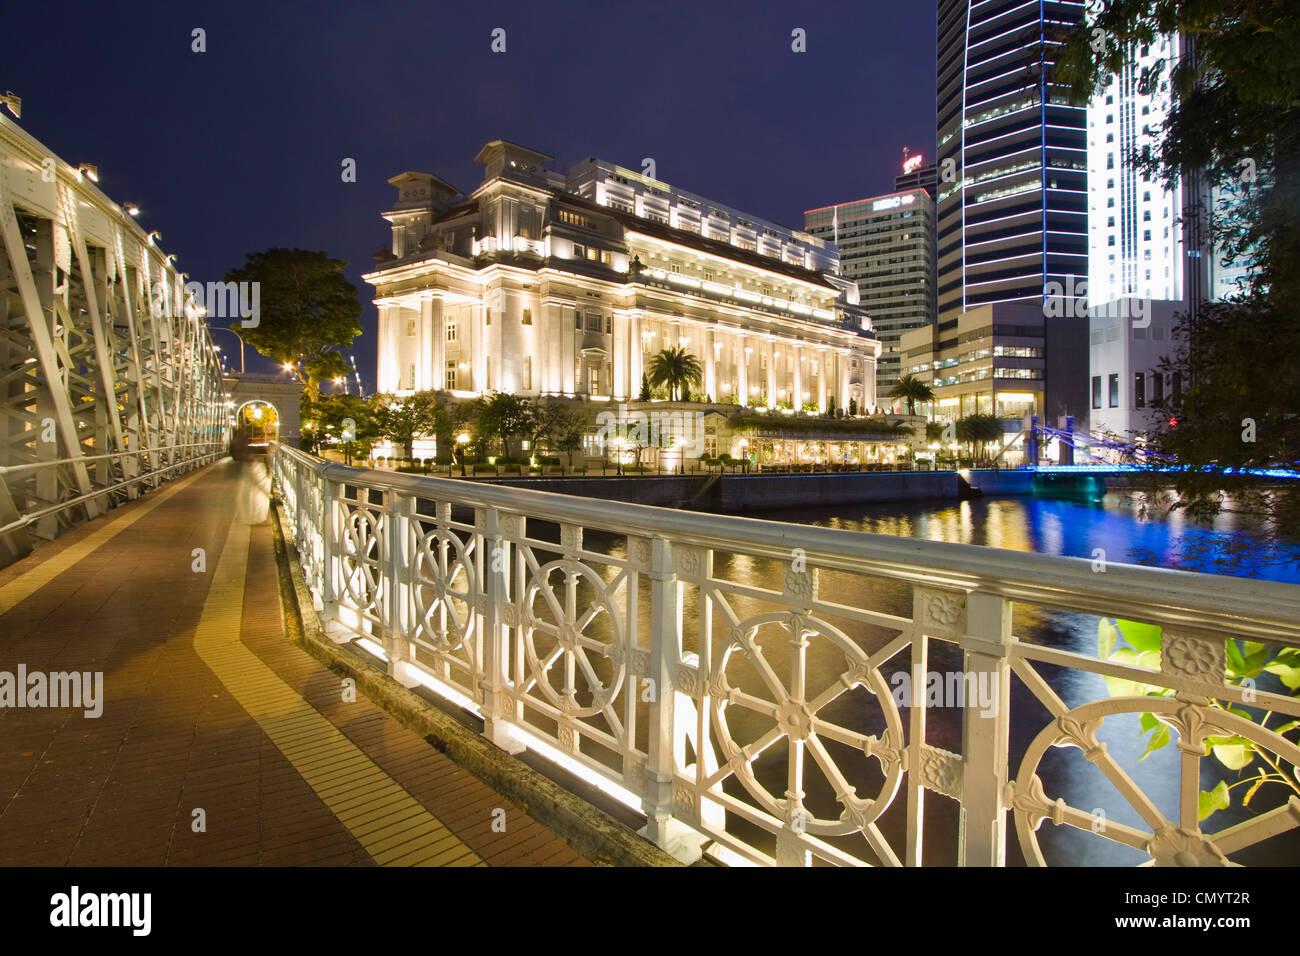 Cavenagh bridge, Fullerton Hotel, Skyline of Singapur, South East Asia, twilight Stock Photo